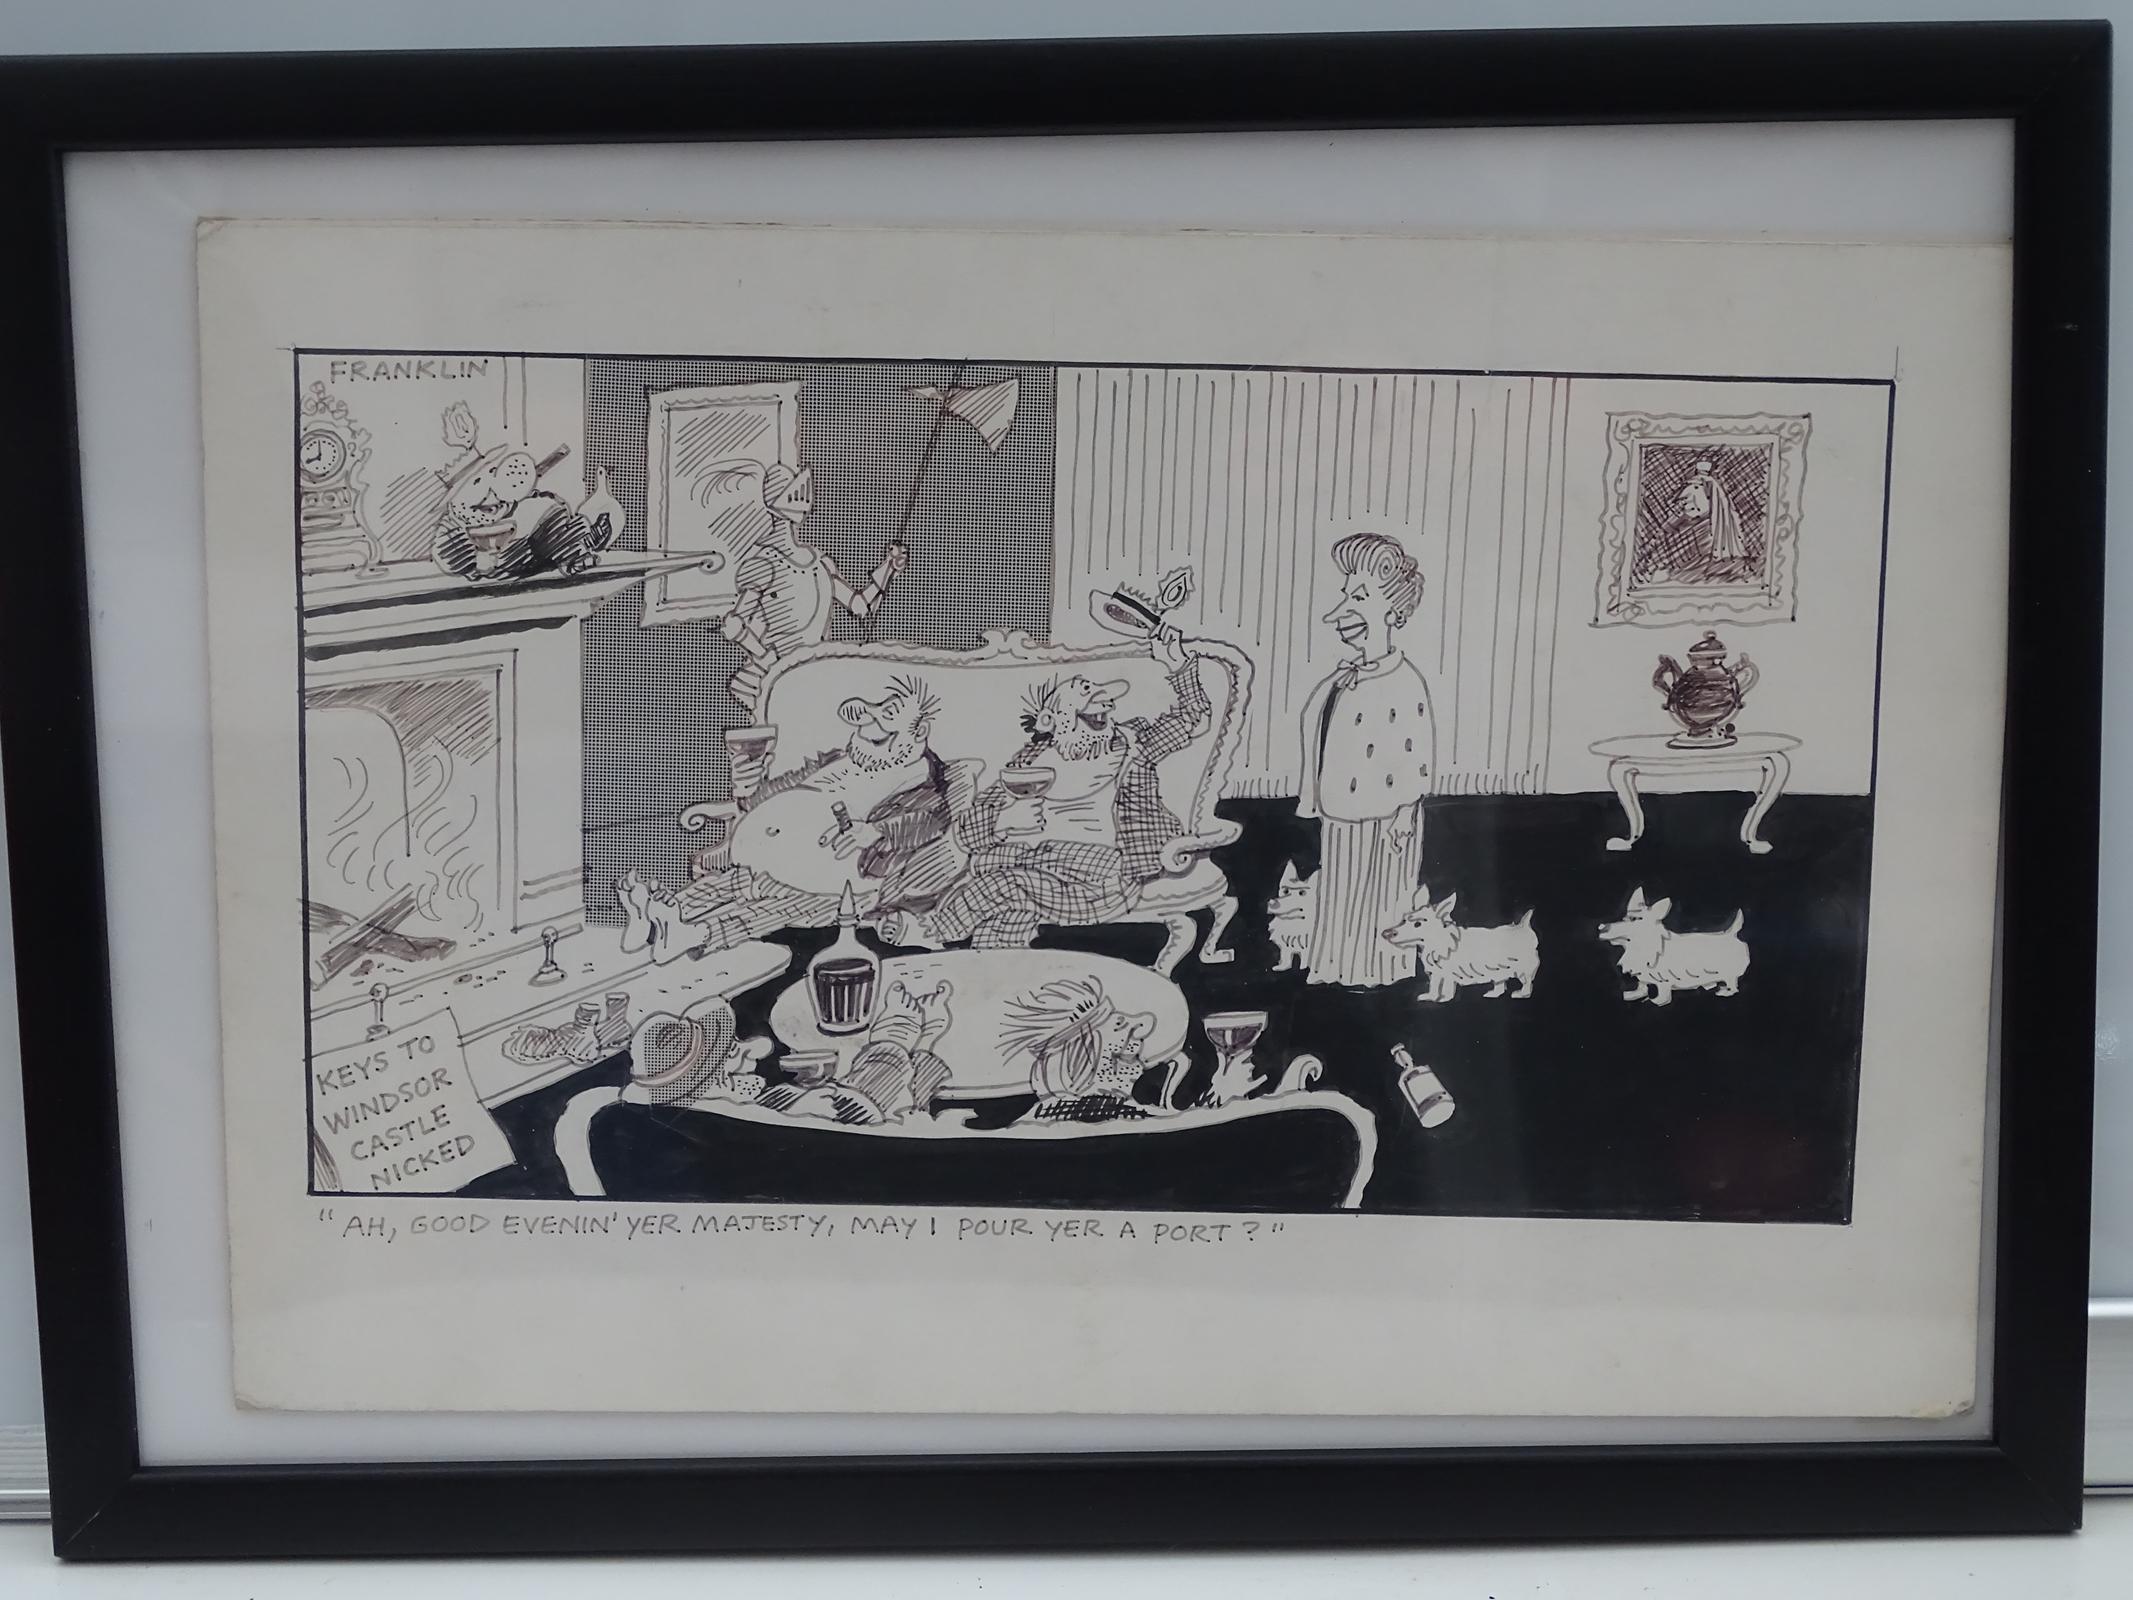 Lot 1154 - FRANKLIN: Black and white - Framed and Glazed Original Satirical Cartoon Artwork